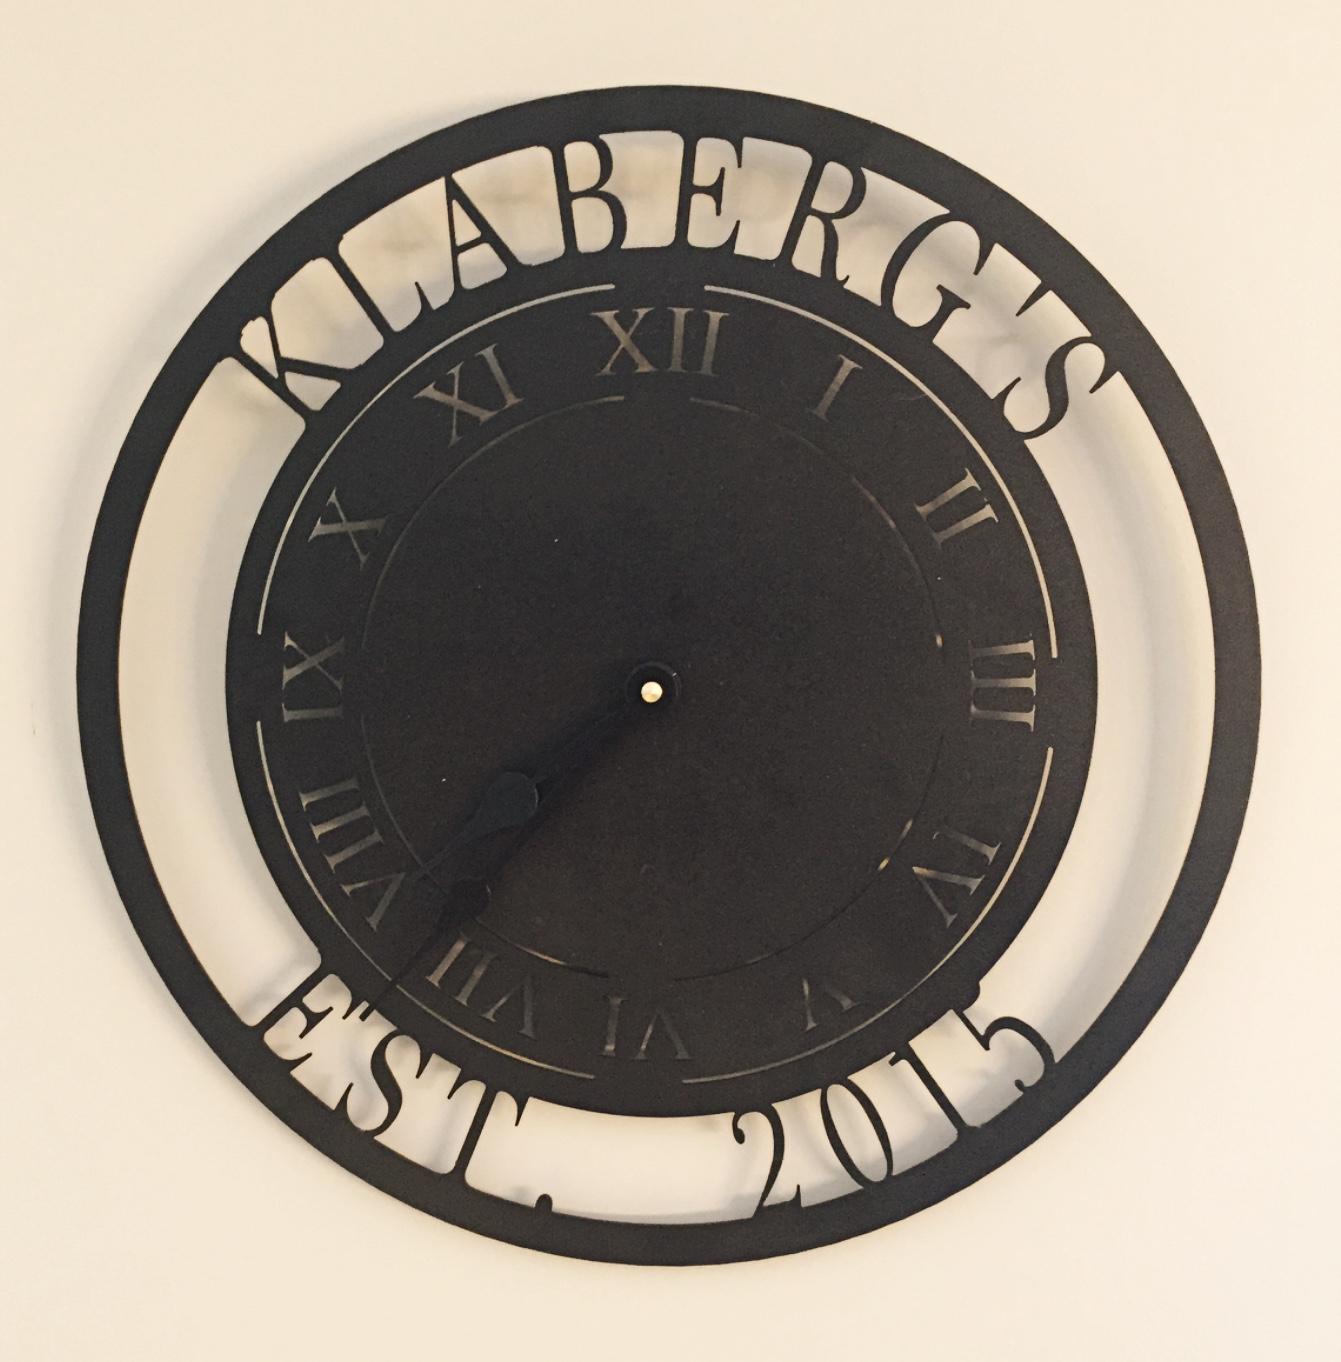 Metal clock with Klabergs 2016 around edges